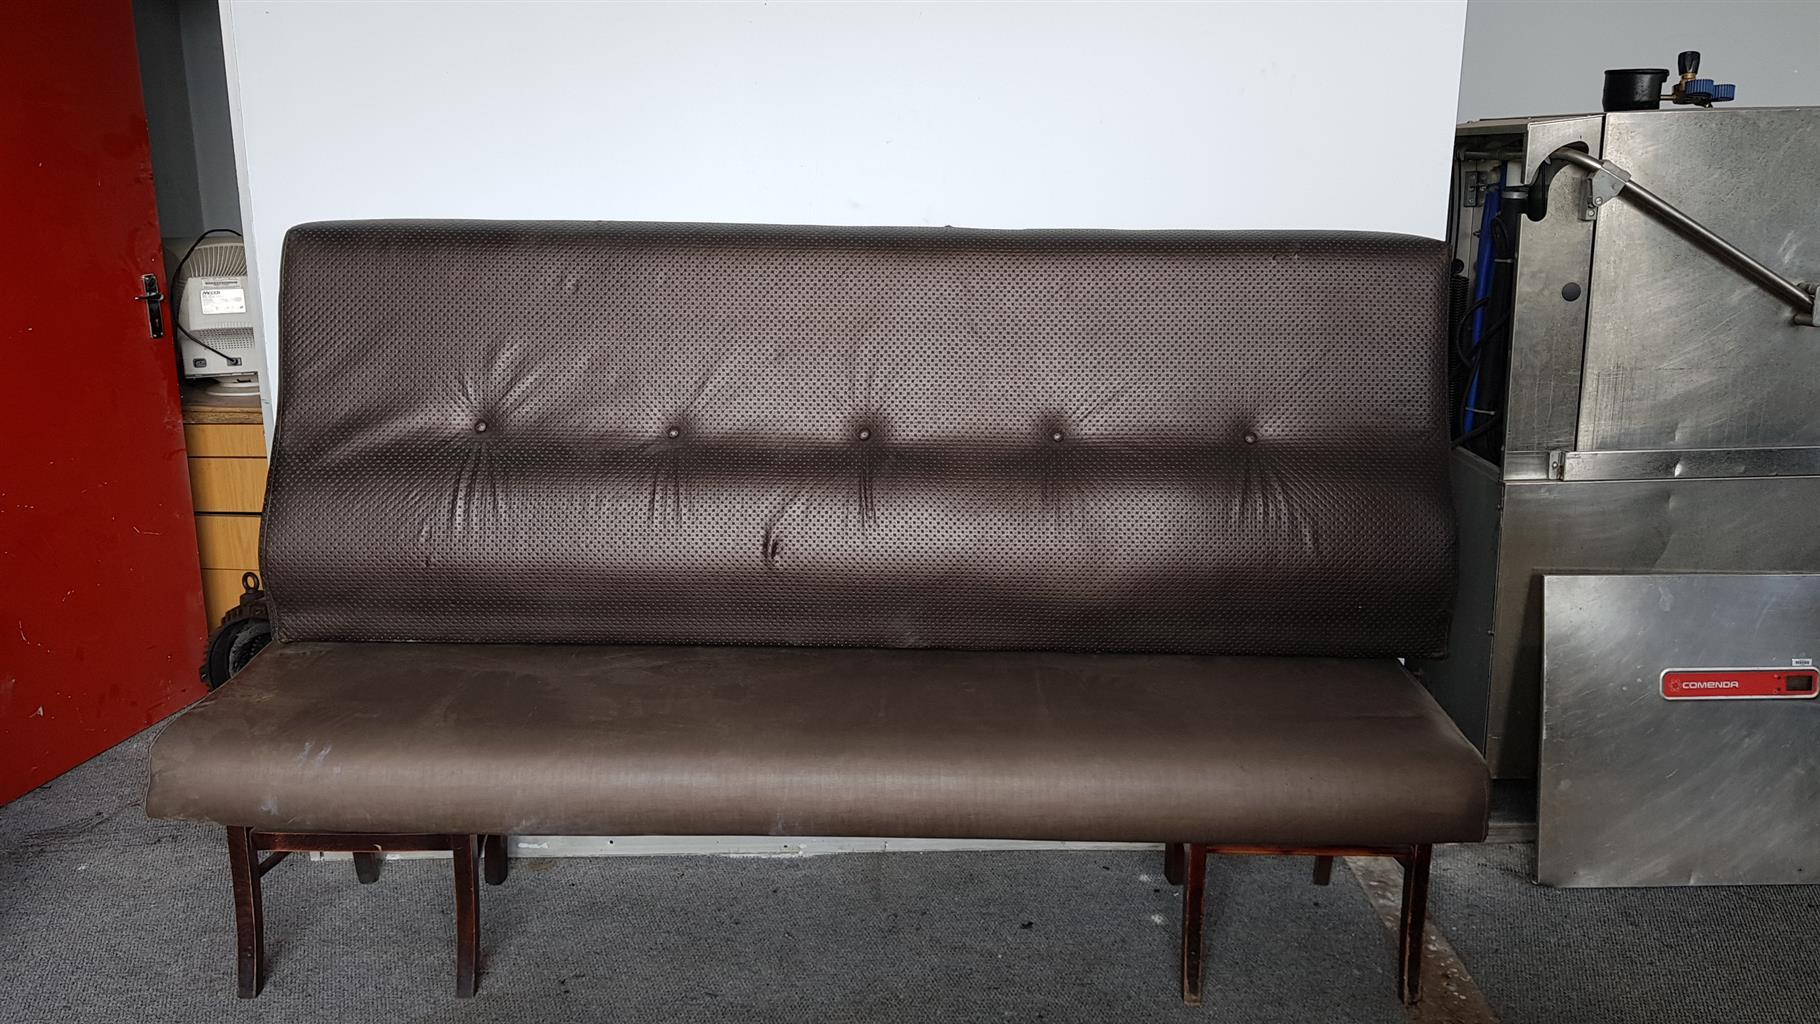 Bunk type seats - chair